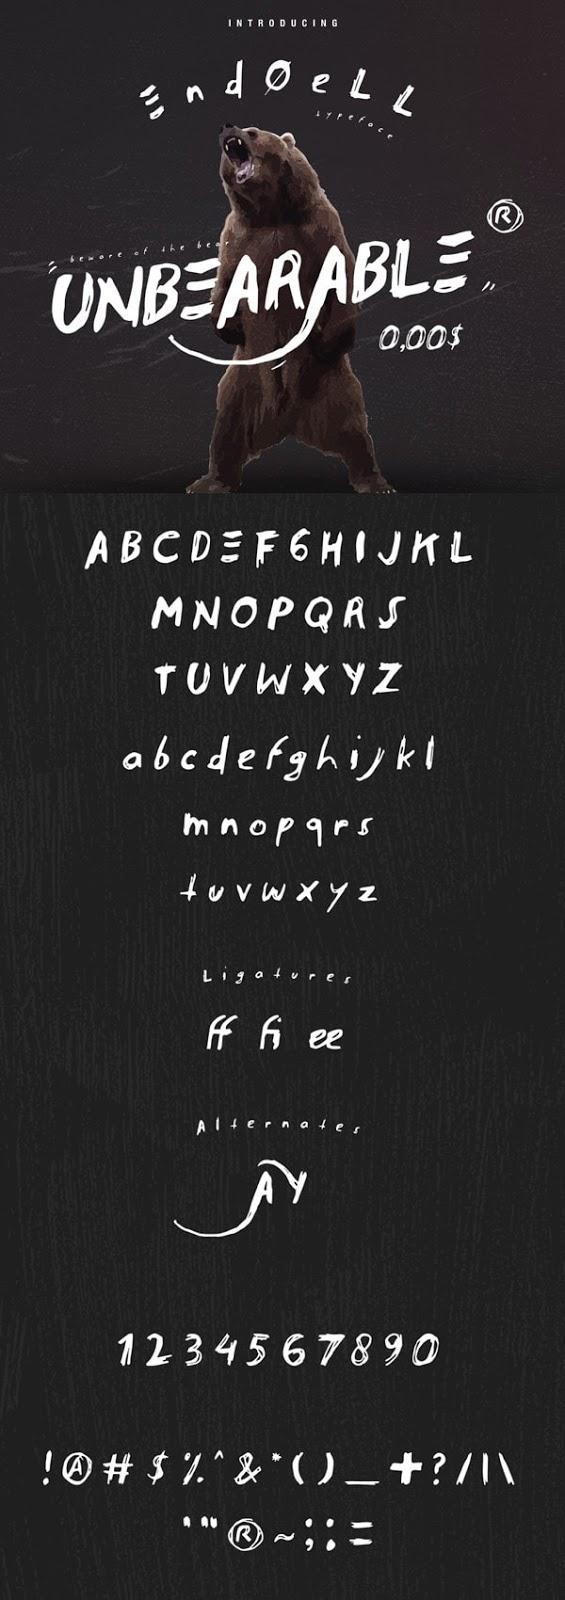 Vintage Font Gratis Terbaik - Endoell Free Vintage Font